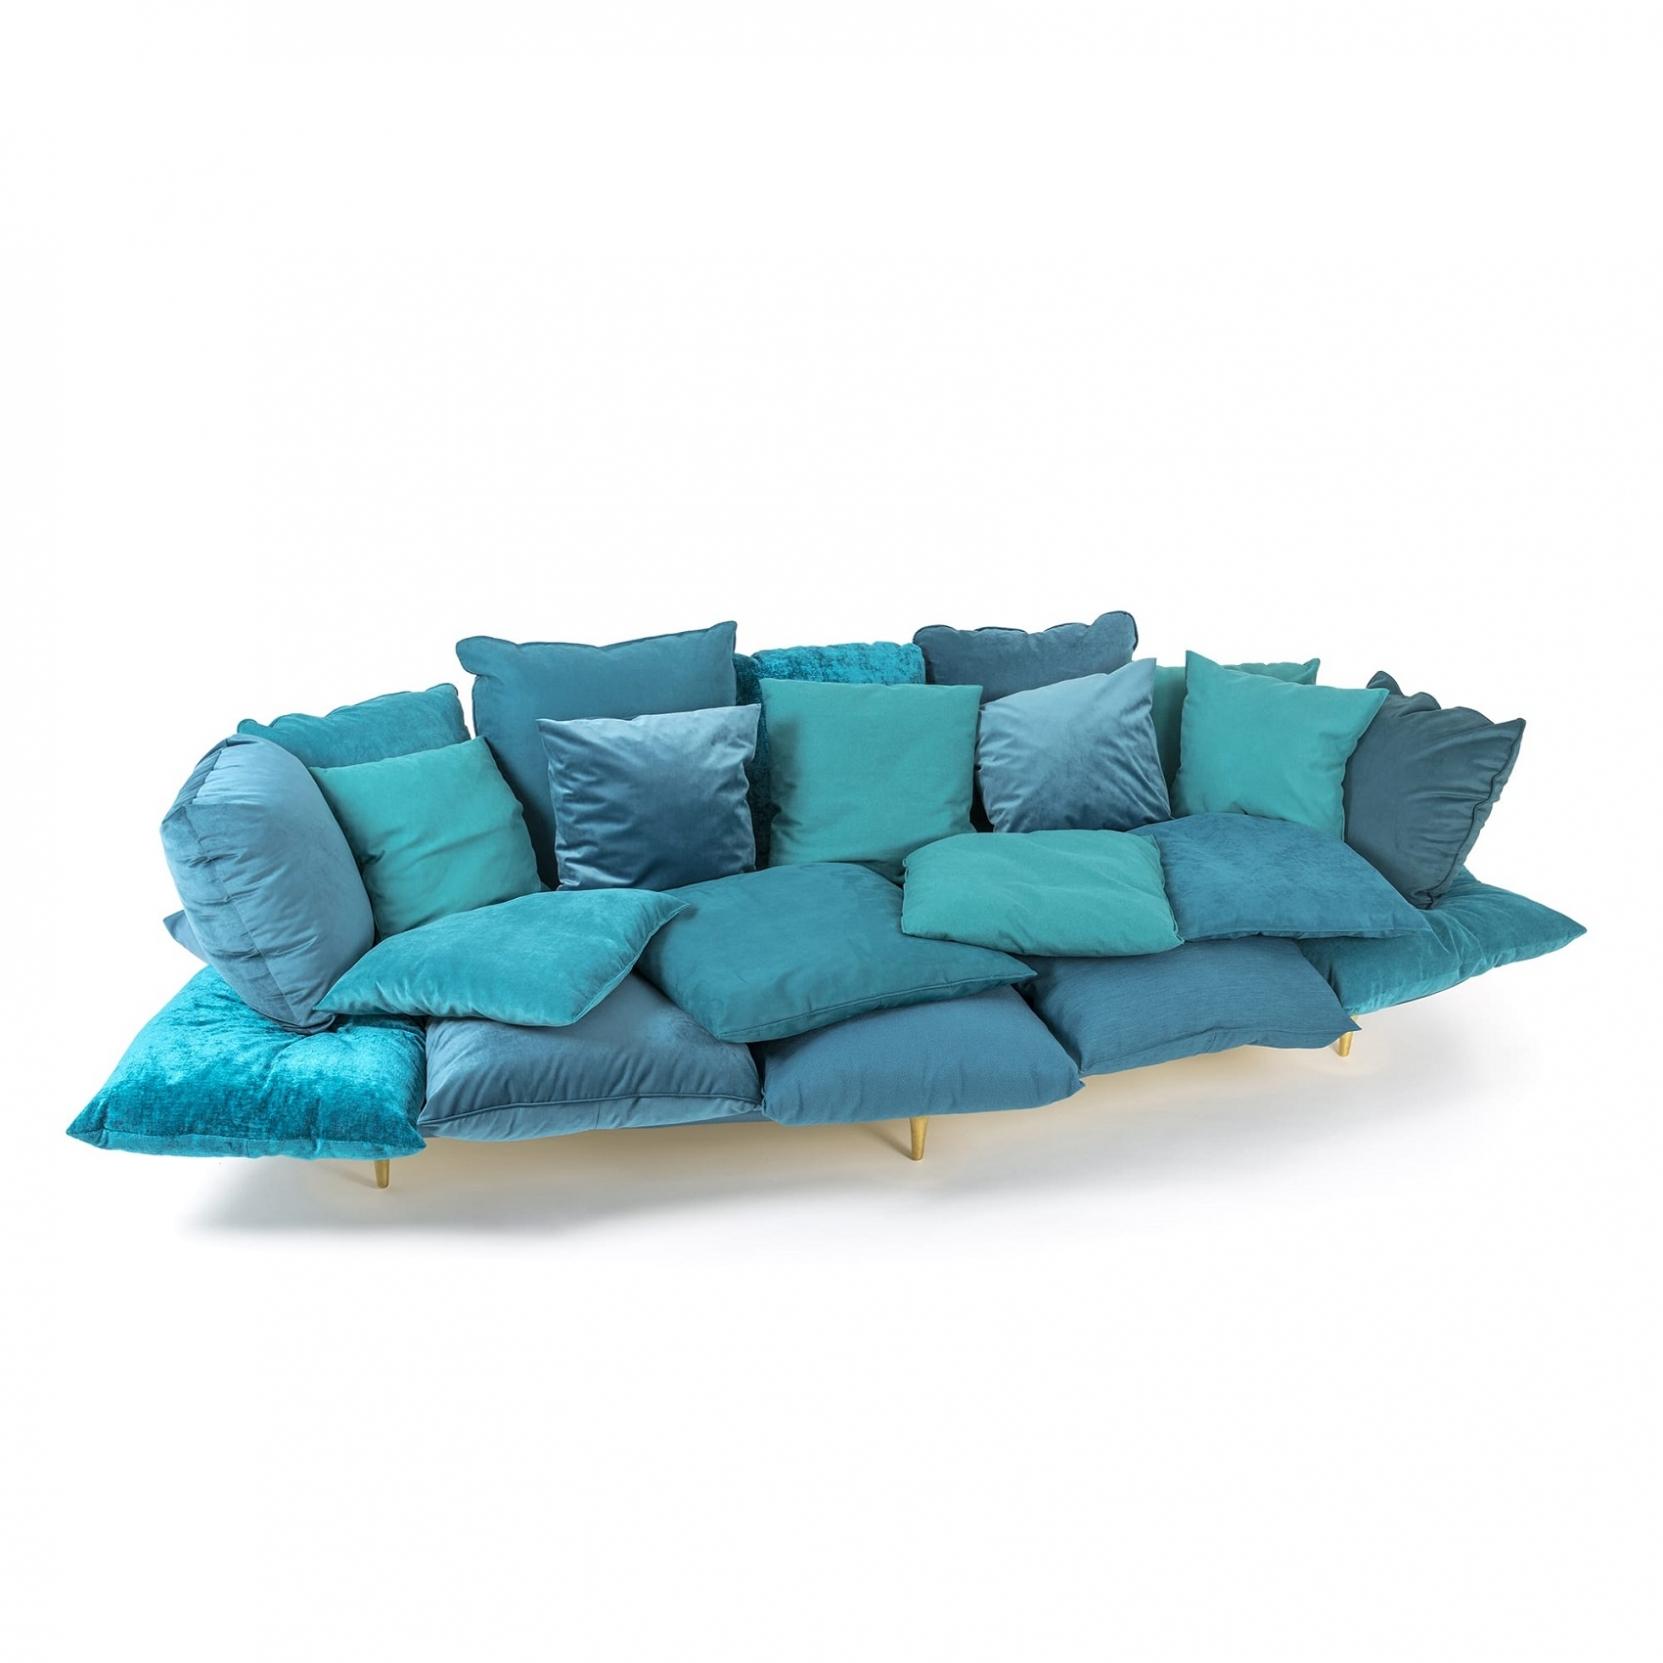 Seletti Comfy Turquoise Sofa Tattahome